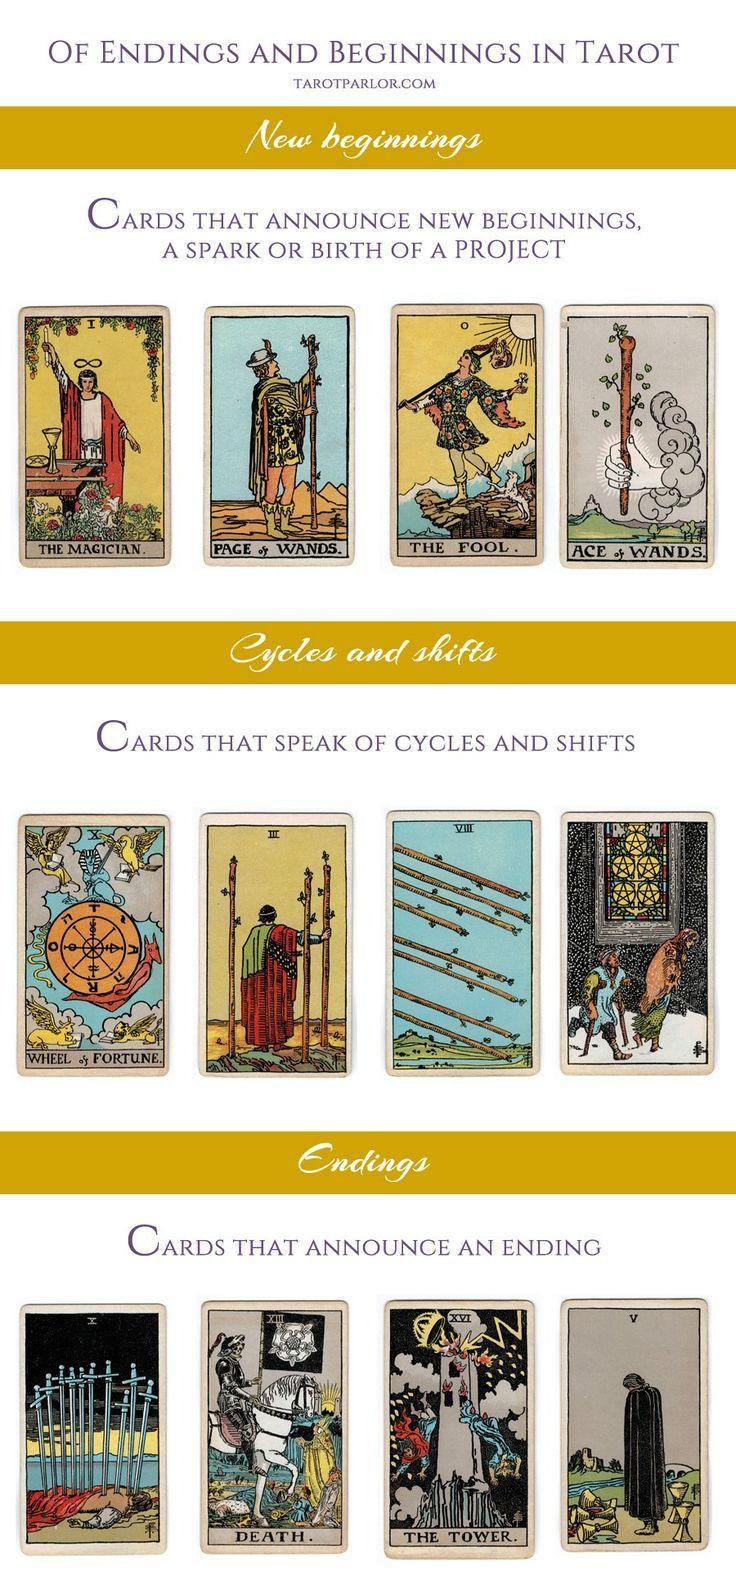 free tarot card reading for scorpio